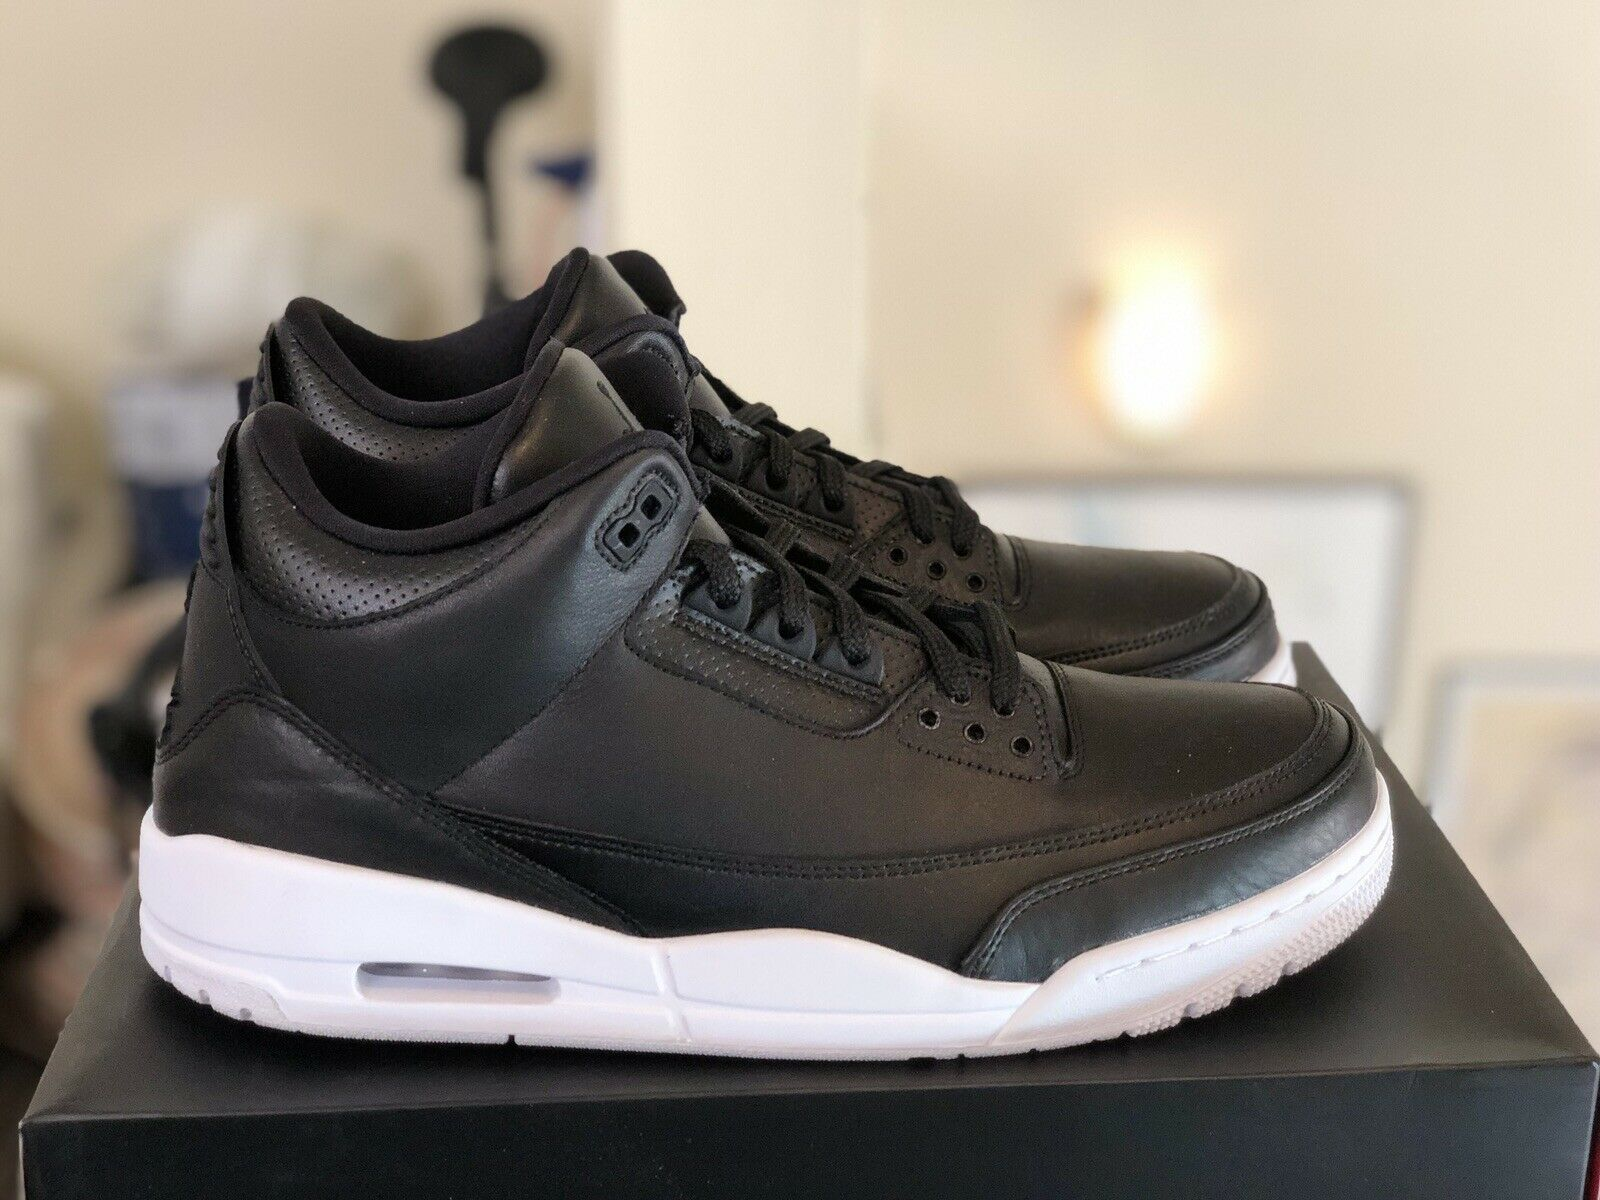 2016 Nike Air Jordan 3 III Retro Cyber Monday 136064 020 Black White Size 11